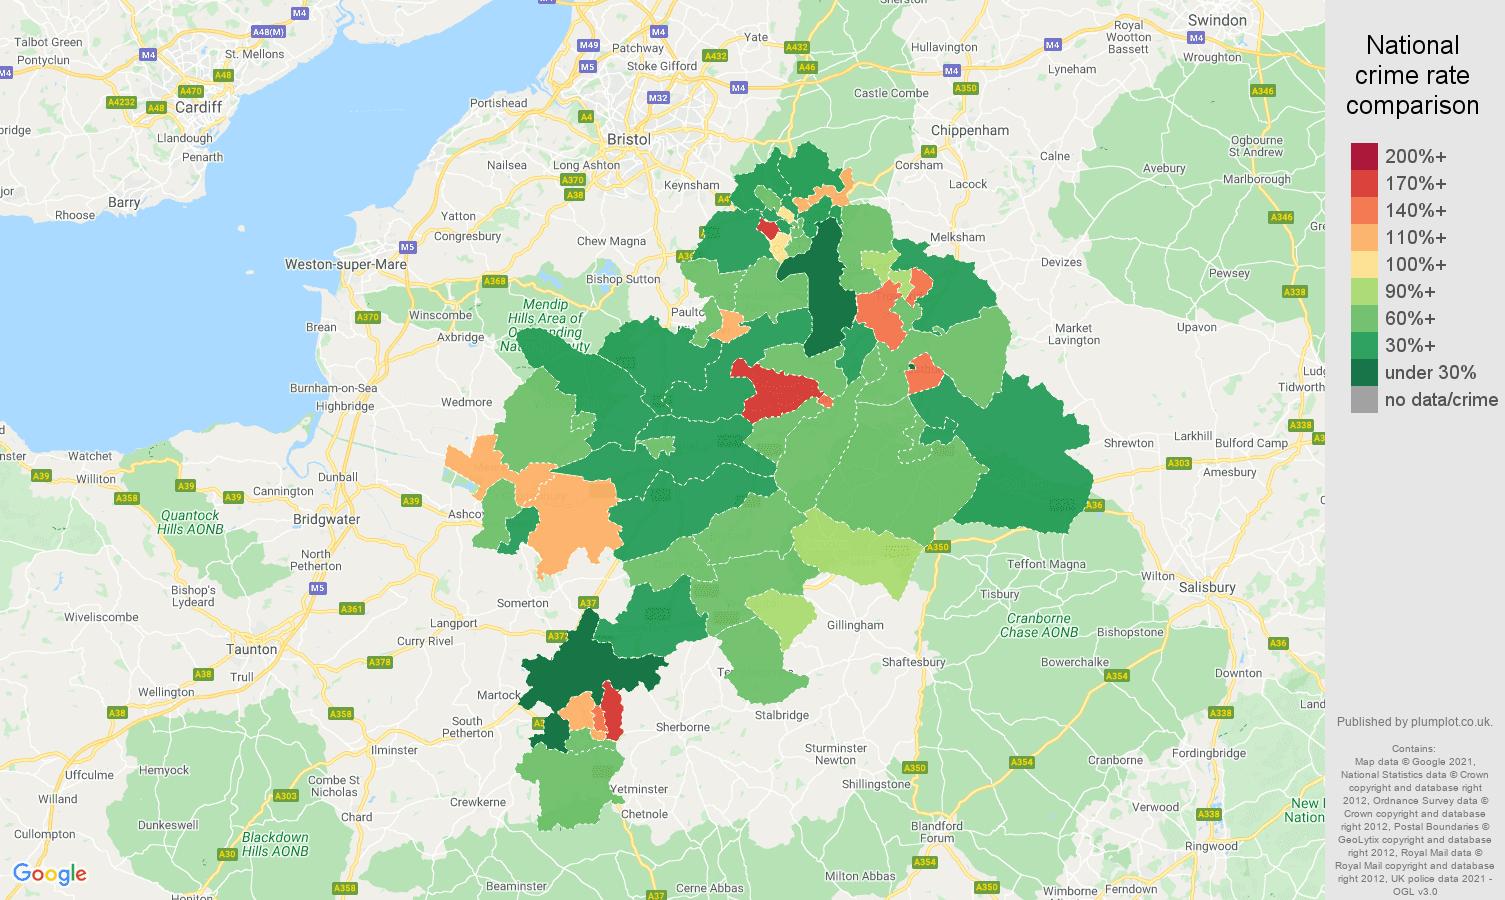 Bath criminal damage and arson crime rate comparison map